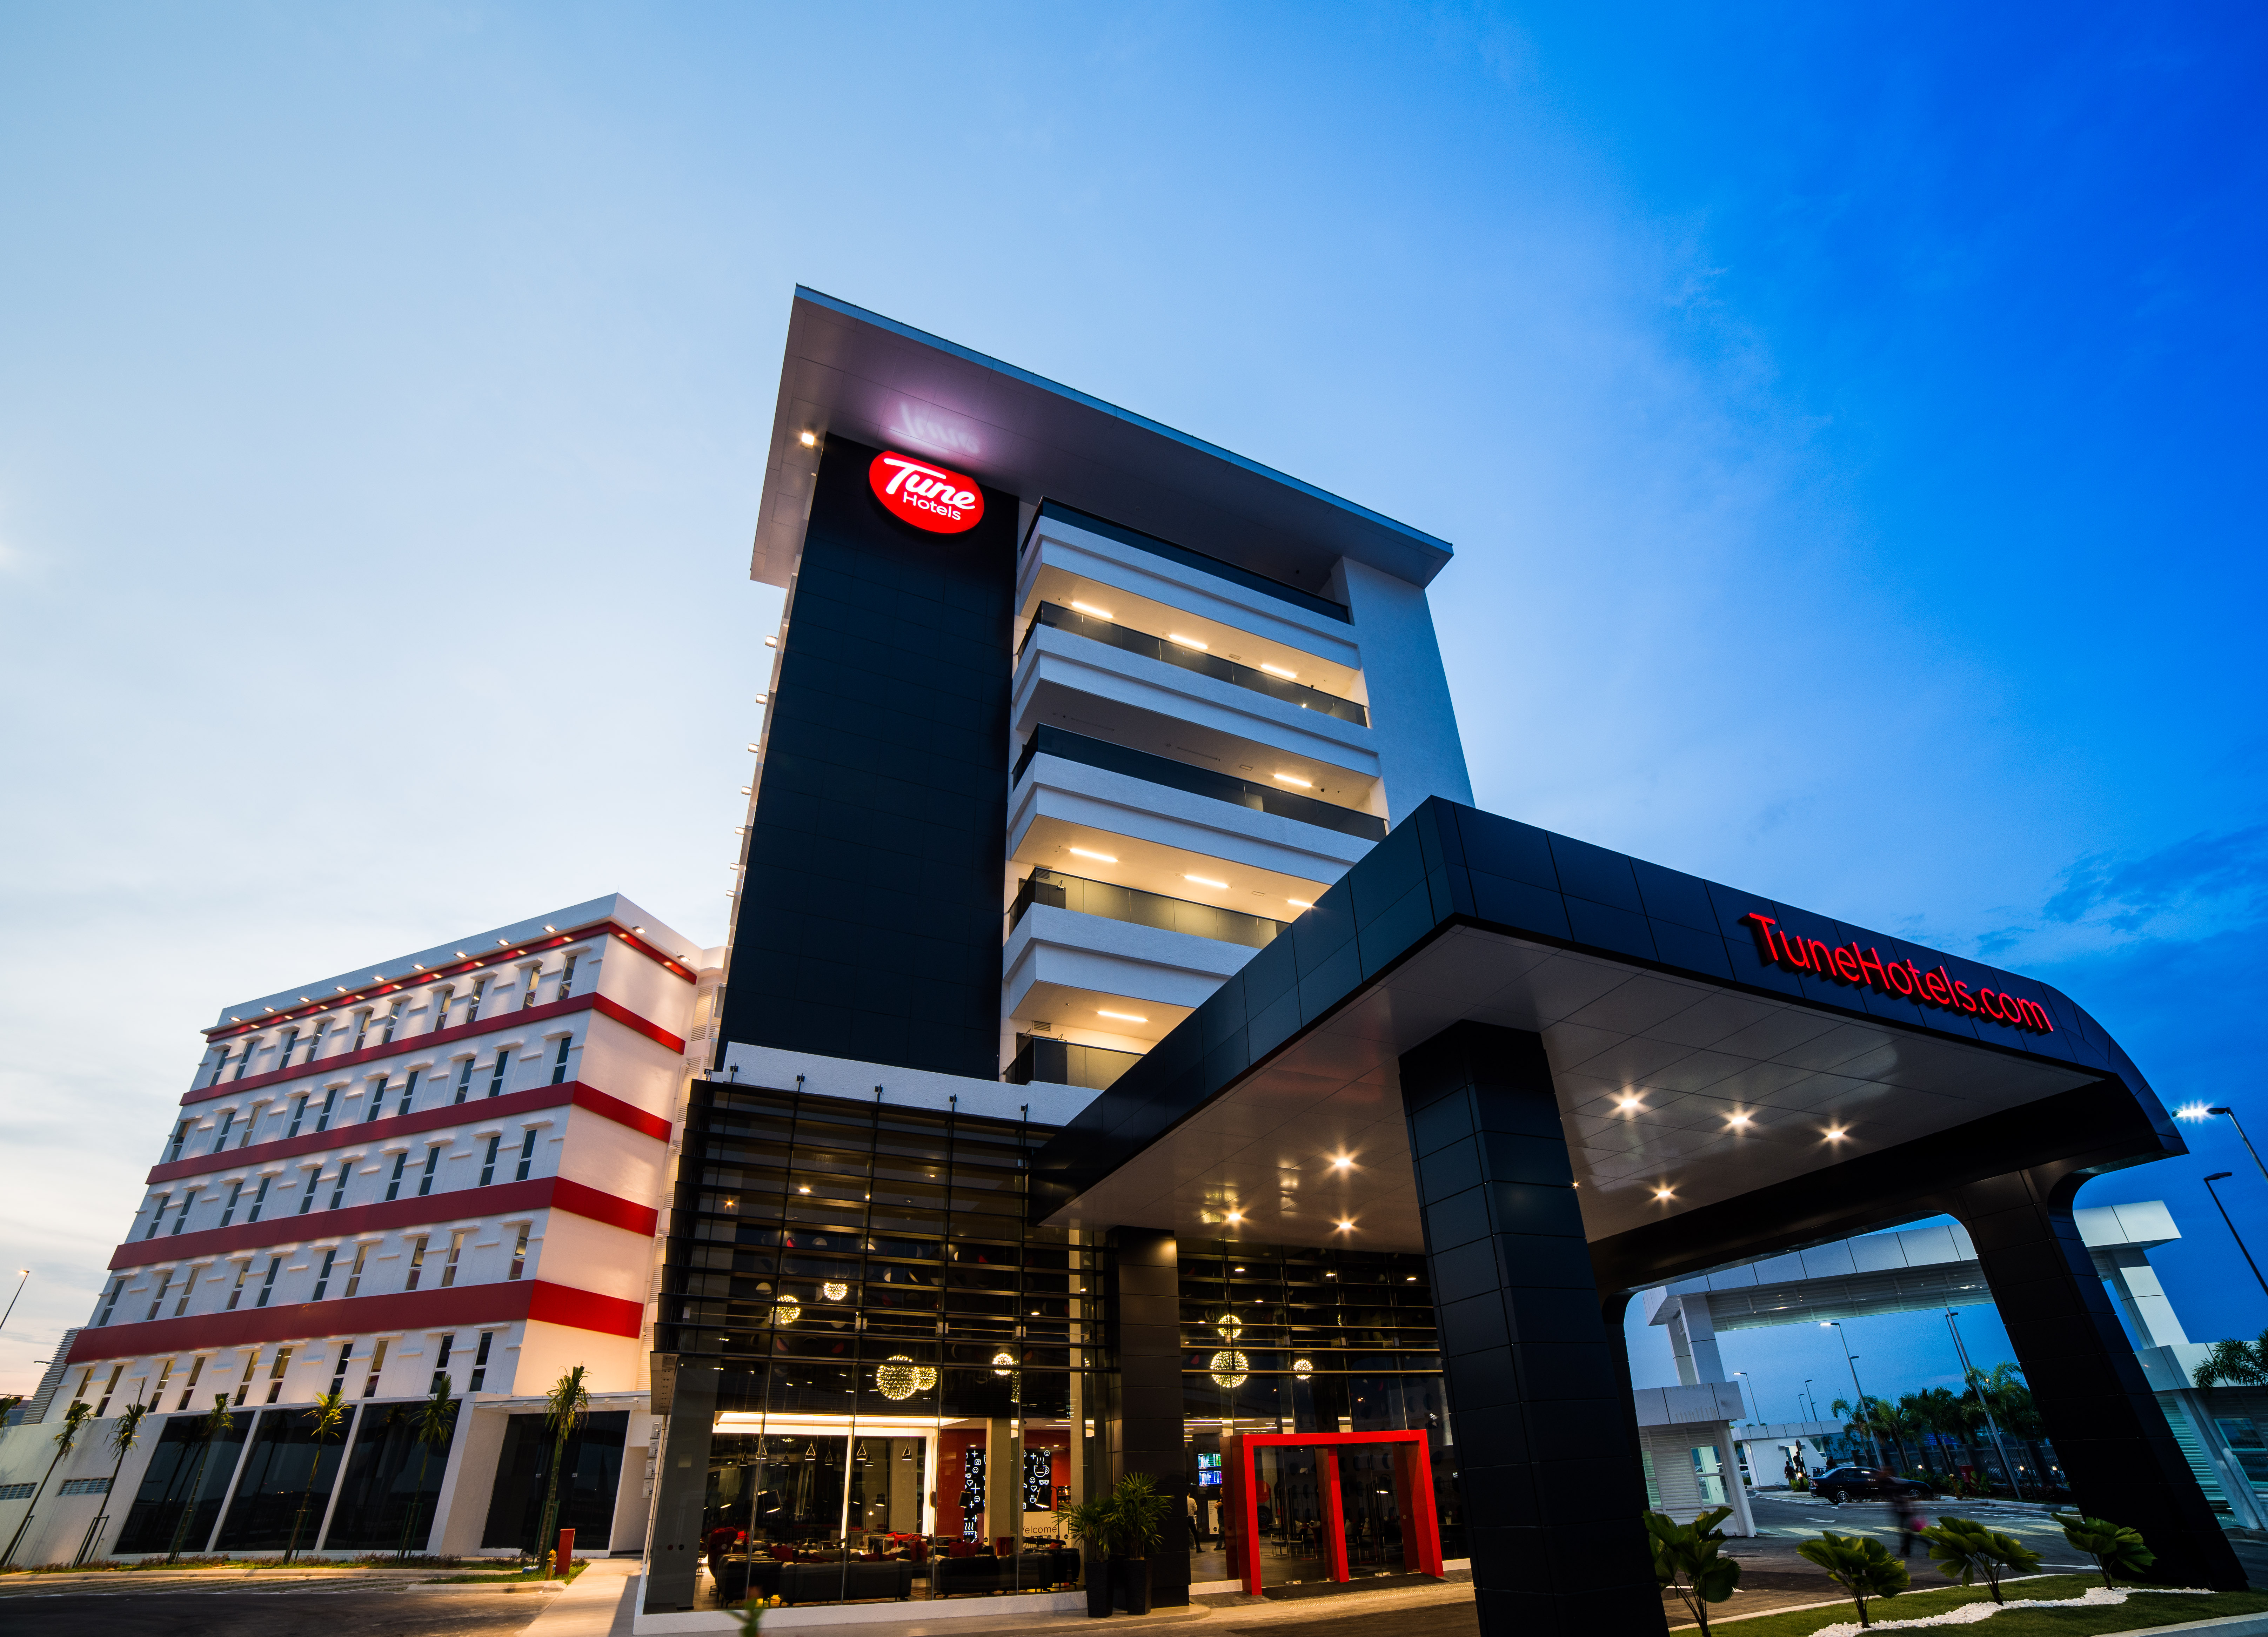 Tune Hotel klia2 - Facade